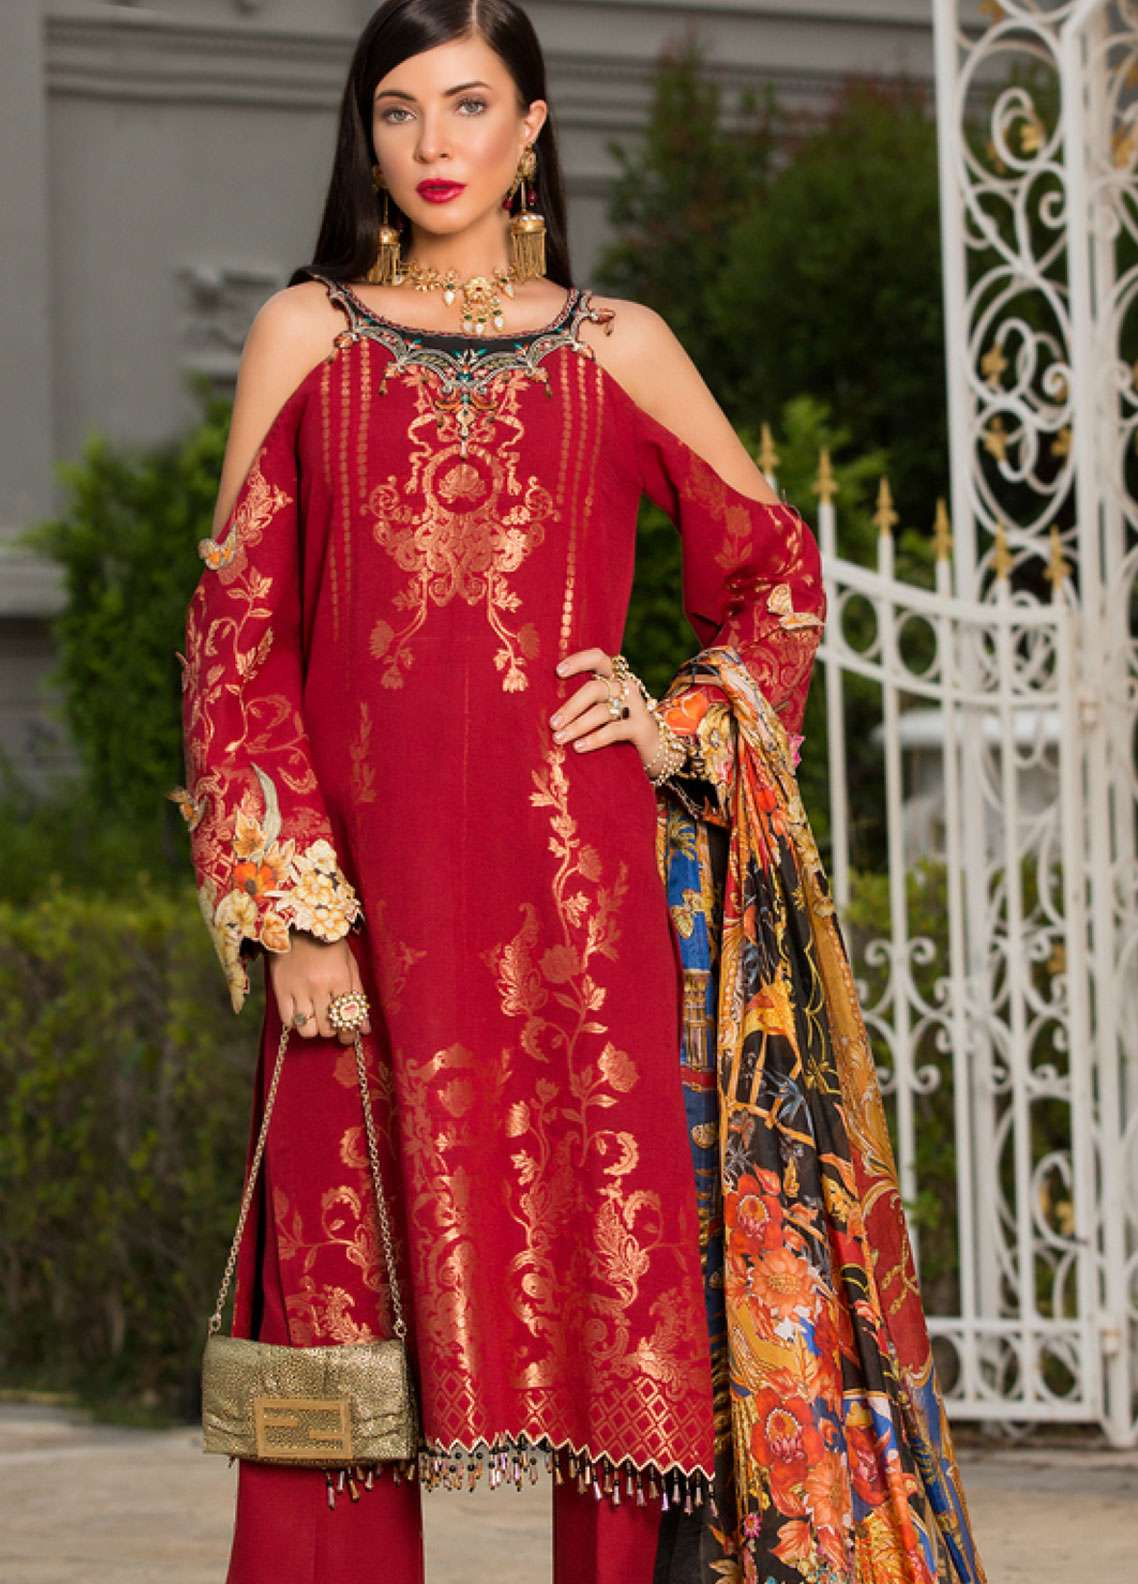 Saadia Asad Embroidered Jacquard Zari Lawn Unstitched 3 Piece Suit NSA19F 04 - Festive Collection